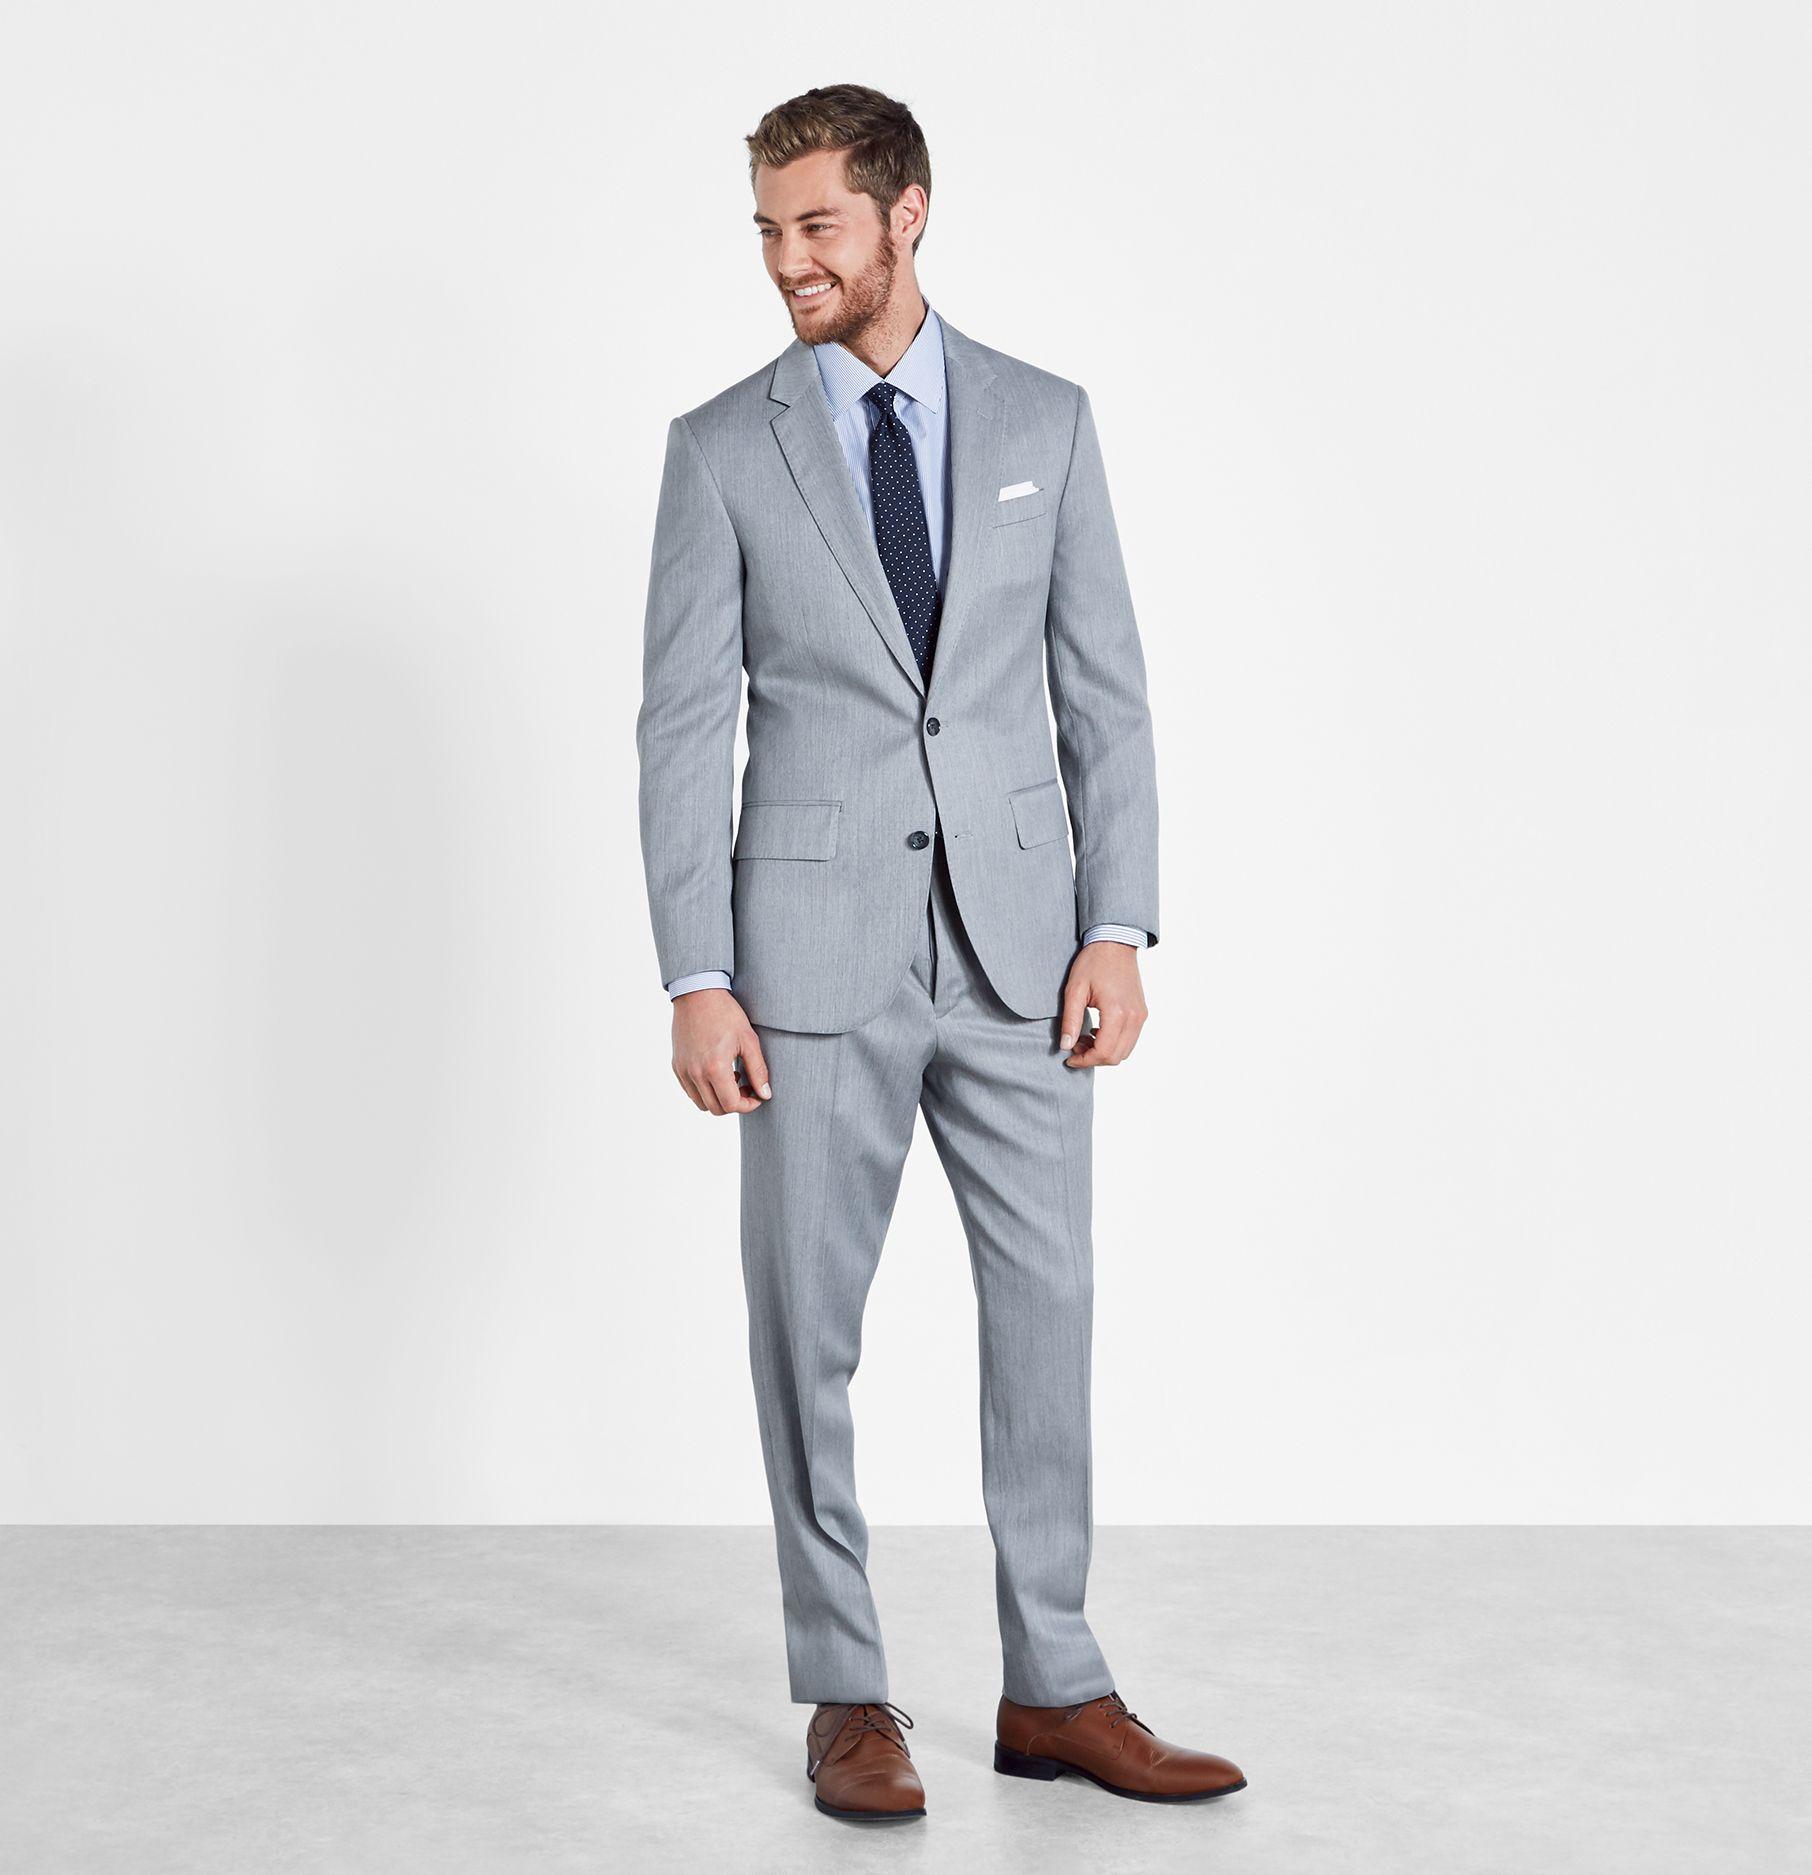 Beautiful Moss Bros Wedding Suit Hire Images - Wedding Dress Ideas ...